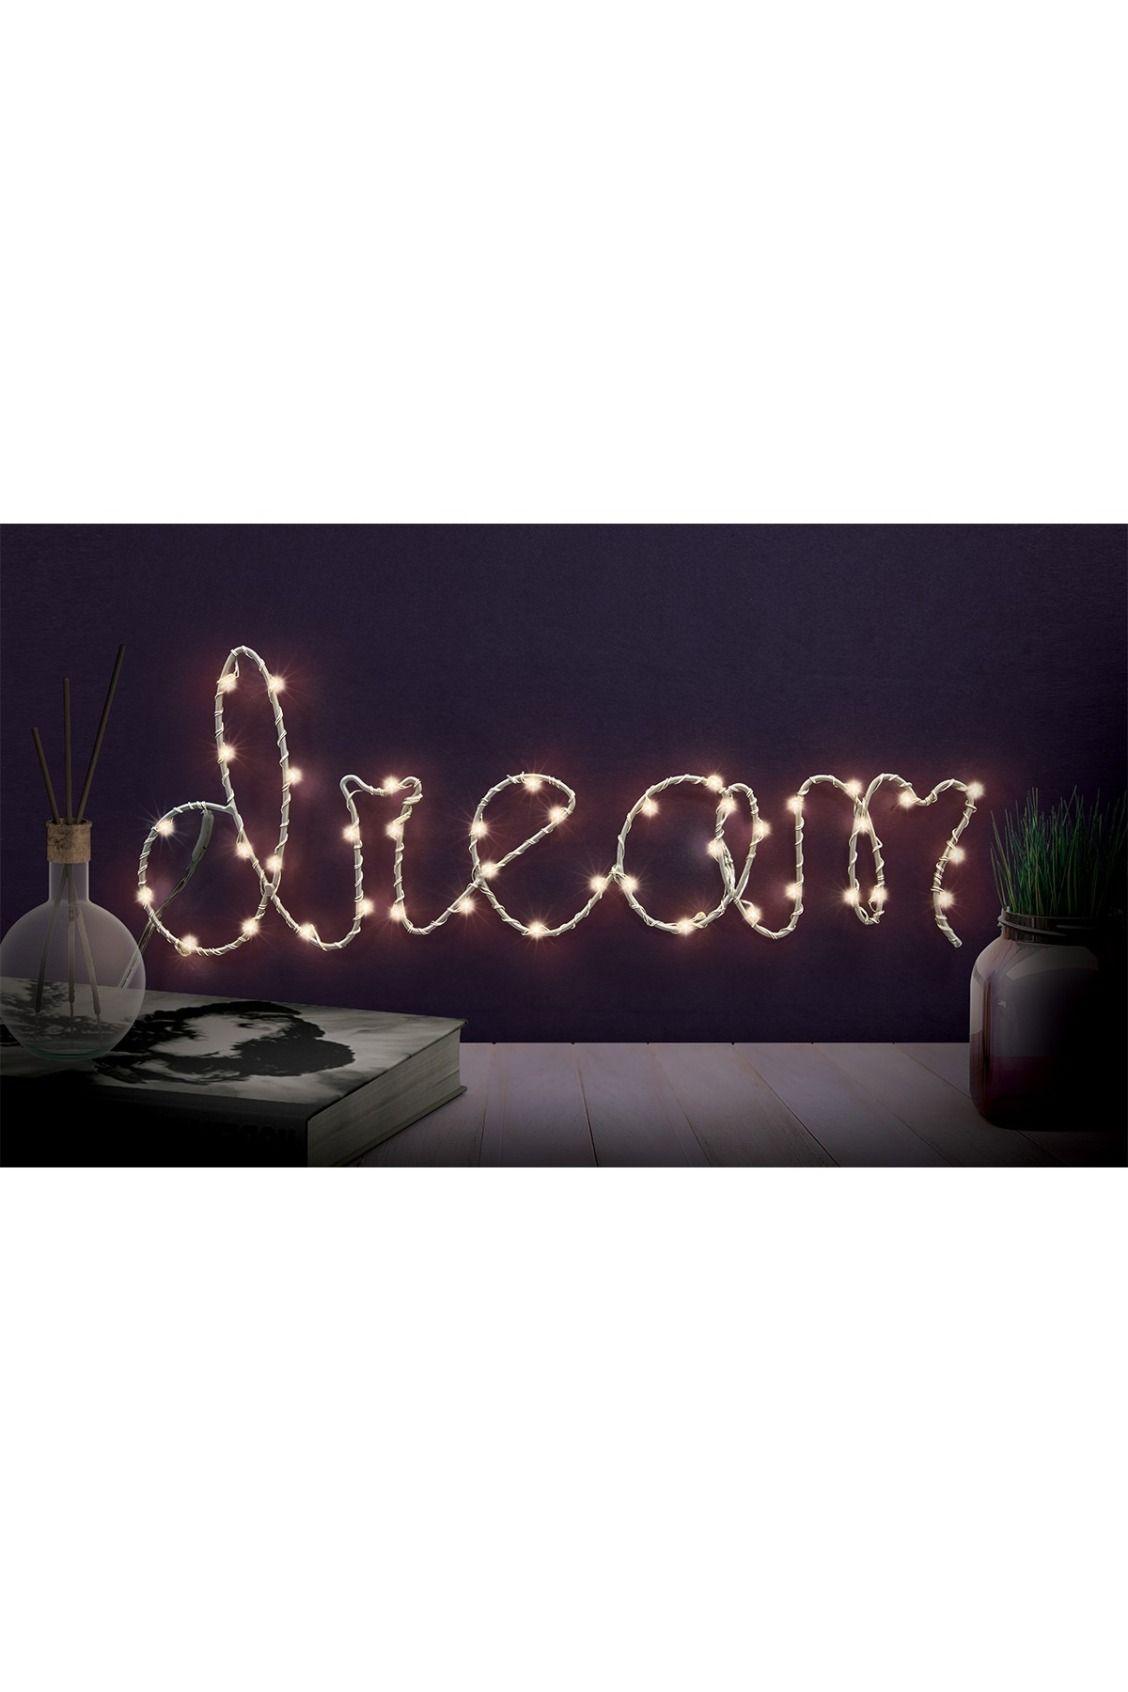 LED lights trace an illuminated Dream word